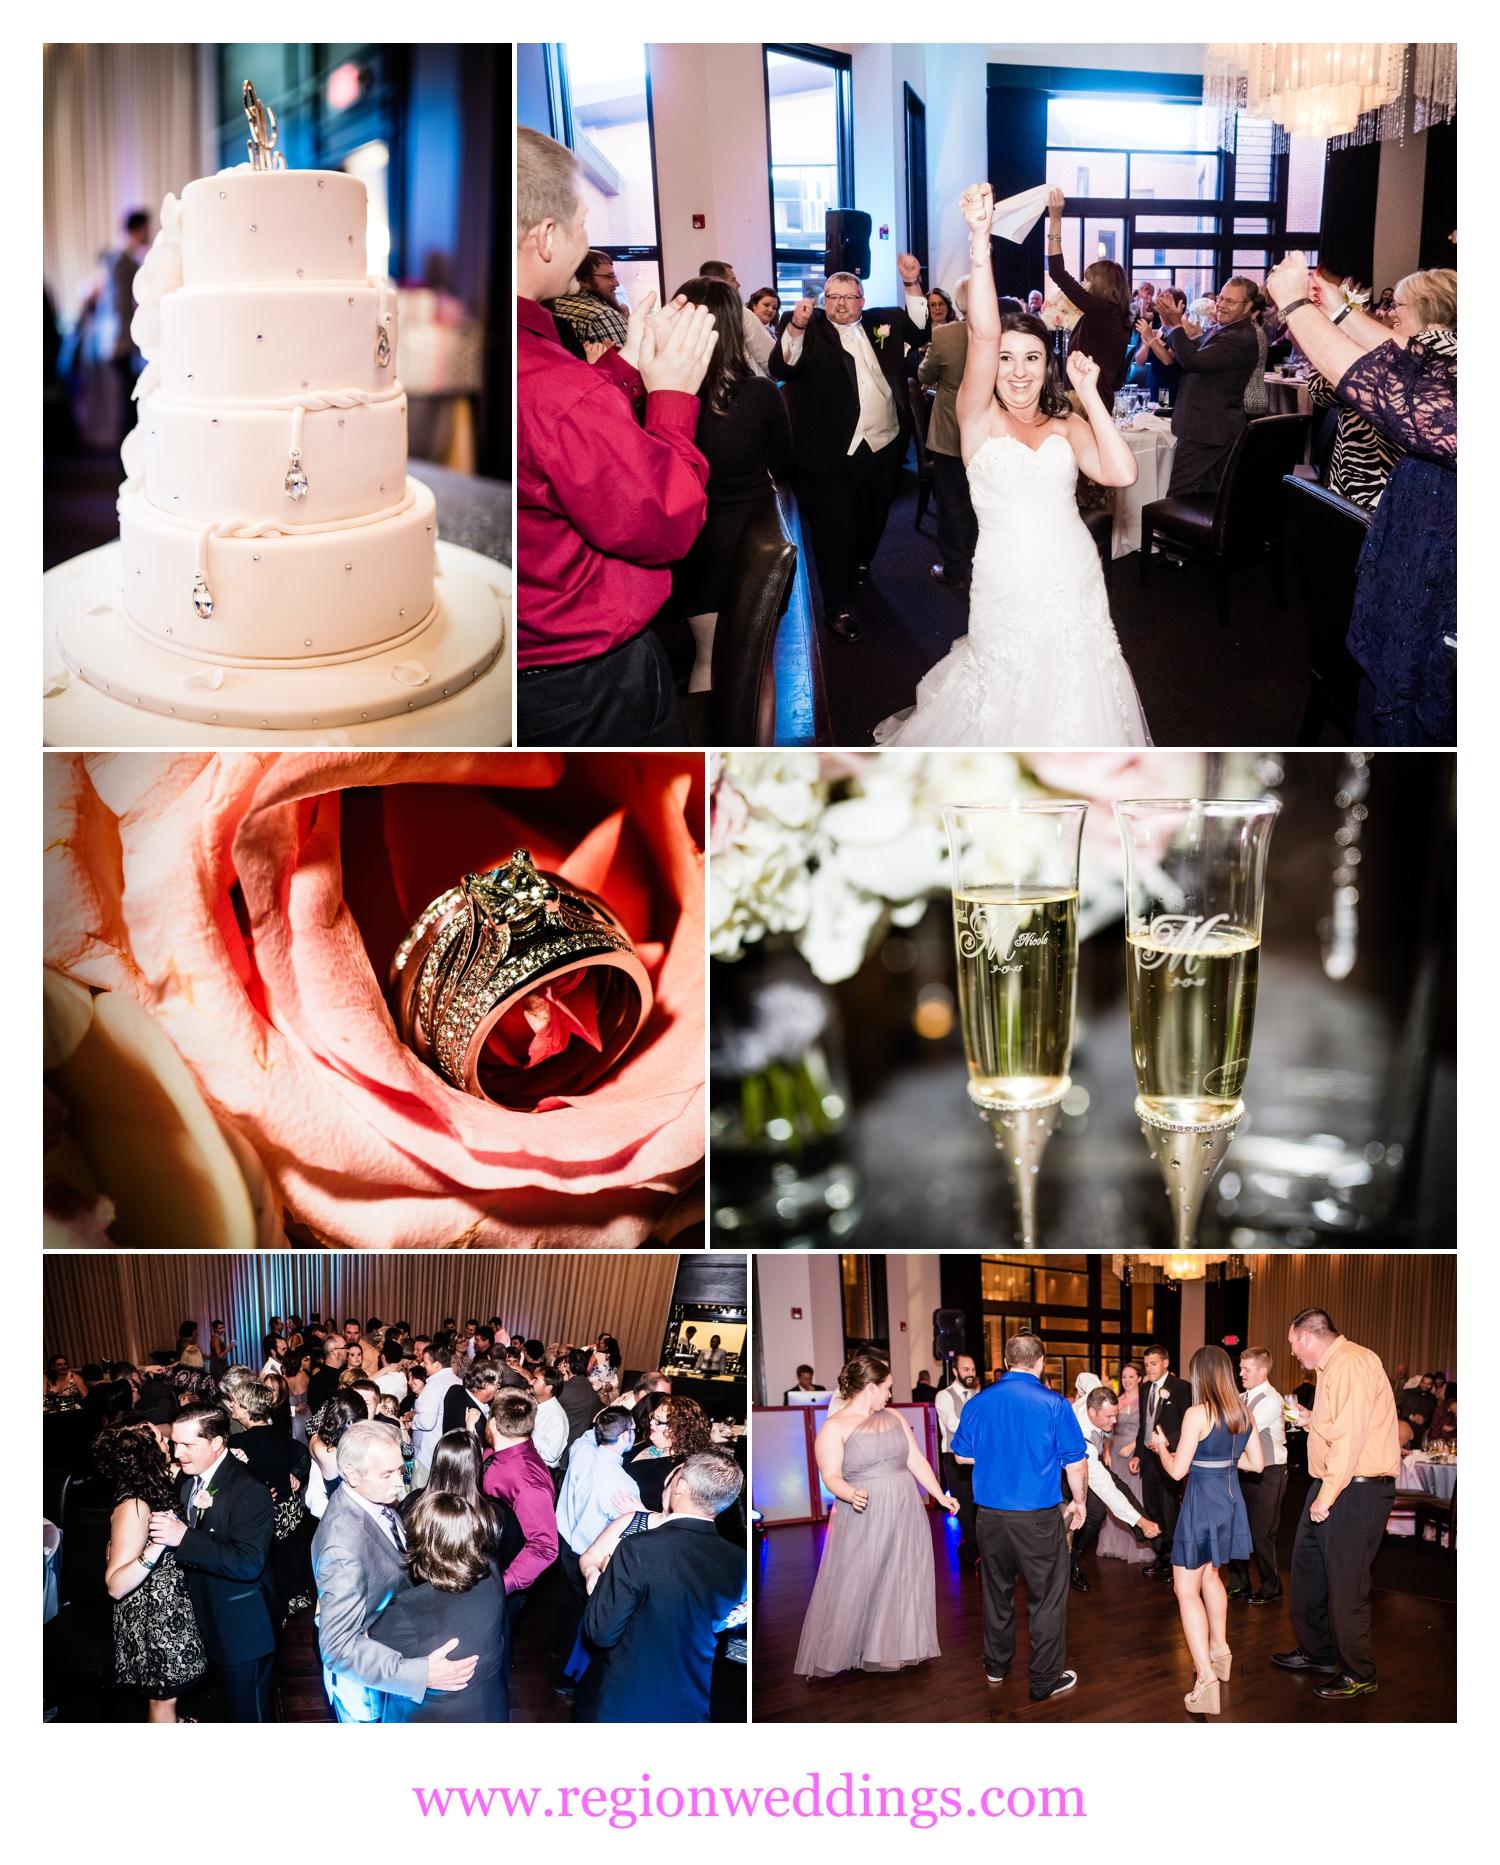 Wedding reception at Gamba's Ristorante in Merrillville, Indiana.